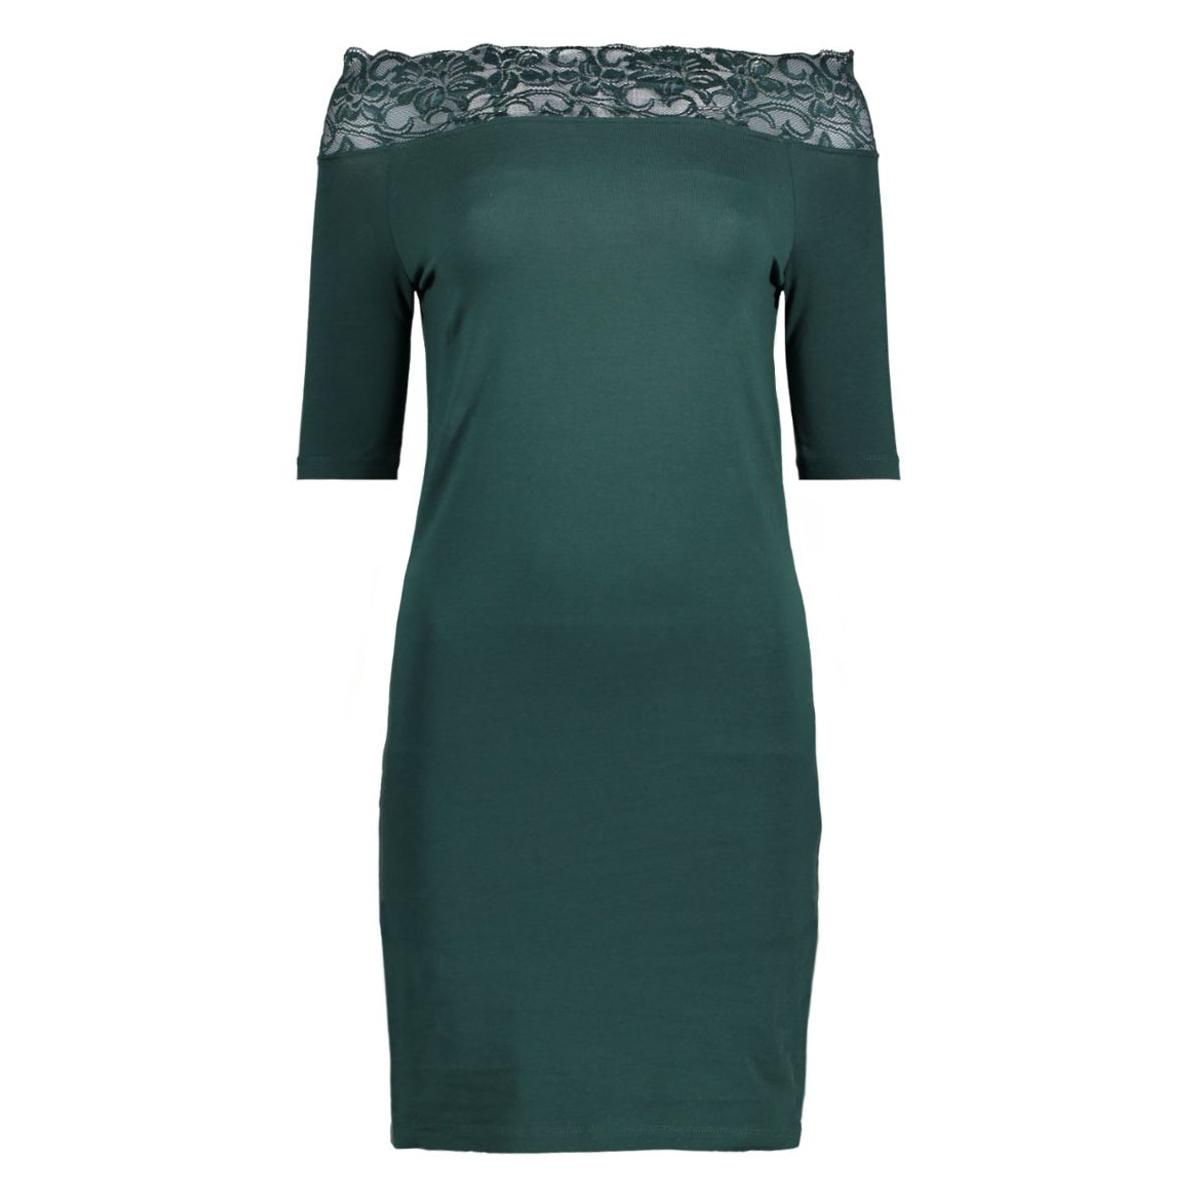 nmlacy 2/4 short dress 10165720 noisy may jurk ponderosa pine